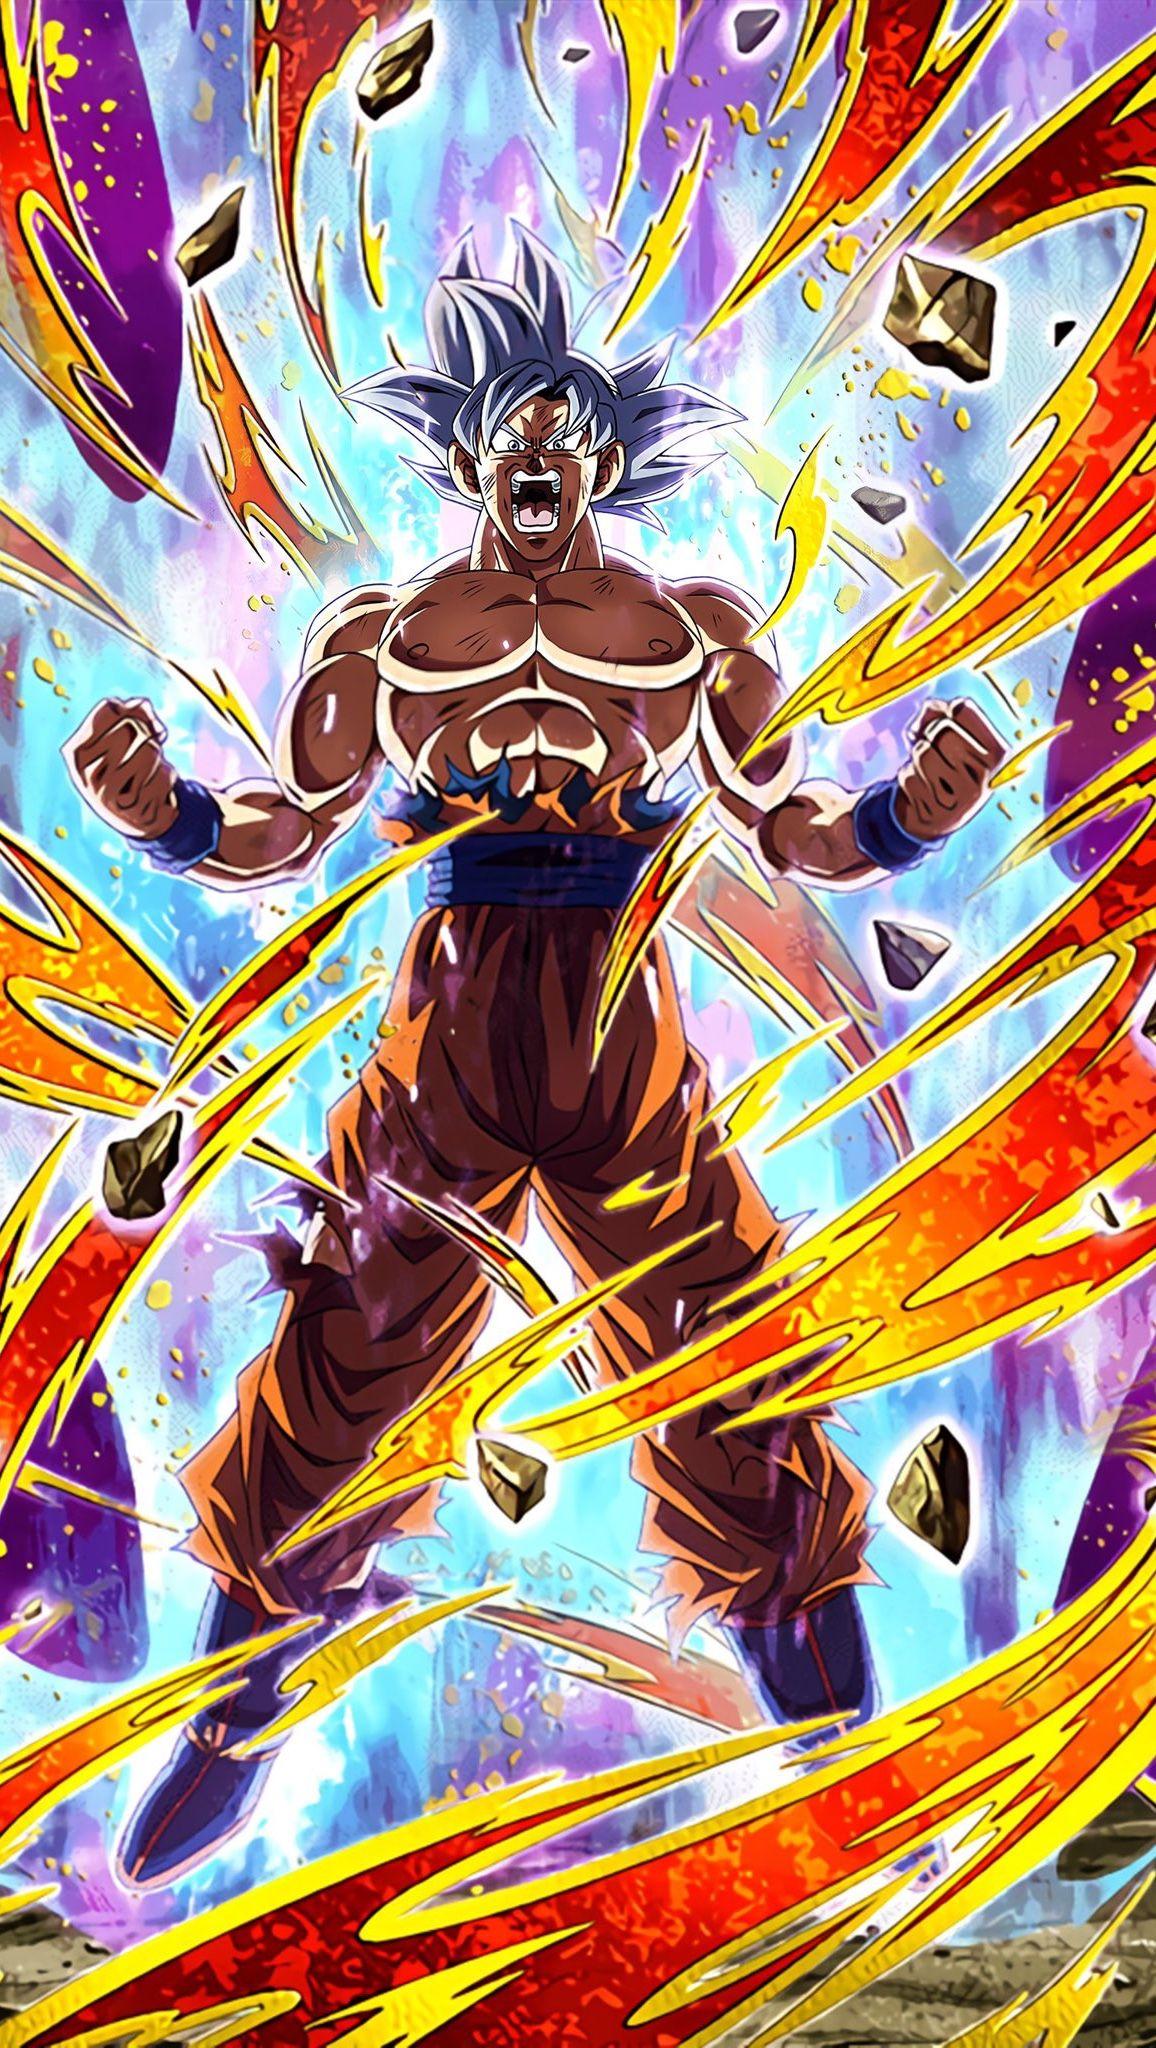 Mastered Ultra Instinct Goku Ur Art In 2021 Dragon Ball Super Artwork Dragon Ball Artwork Dragon Ball Wallpaper Iphone